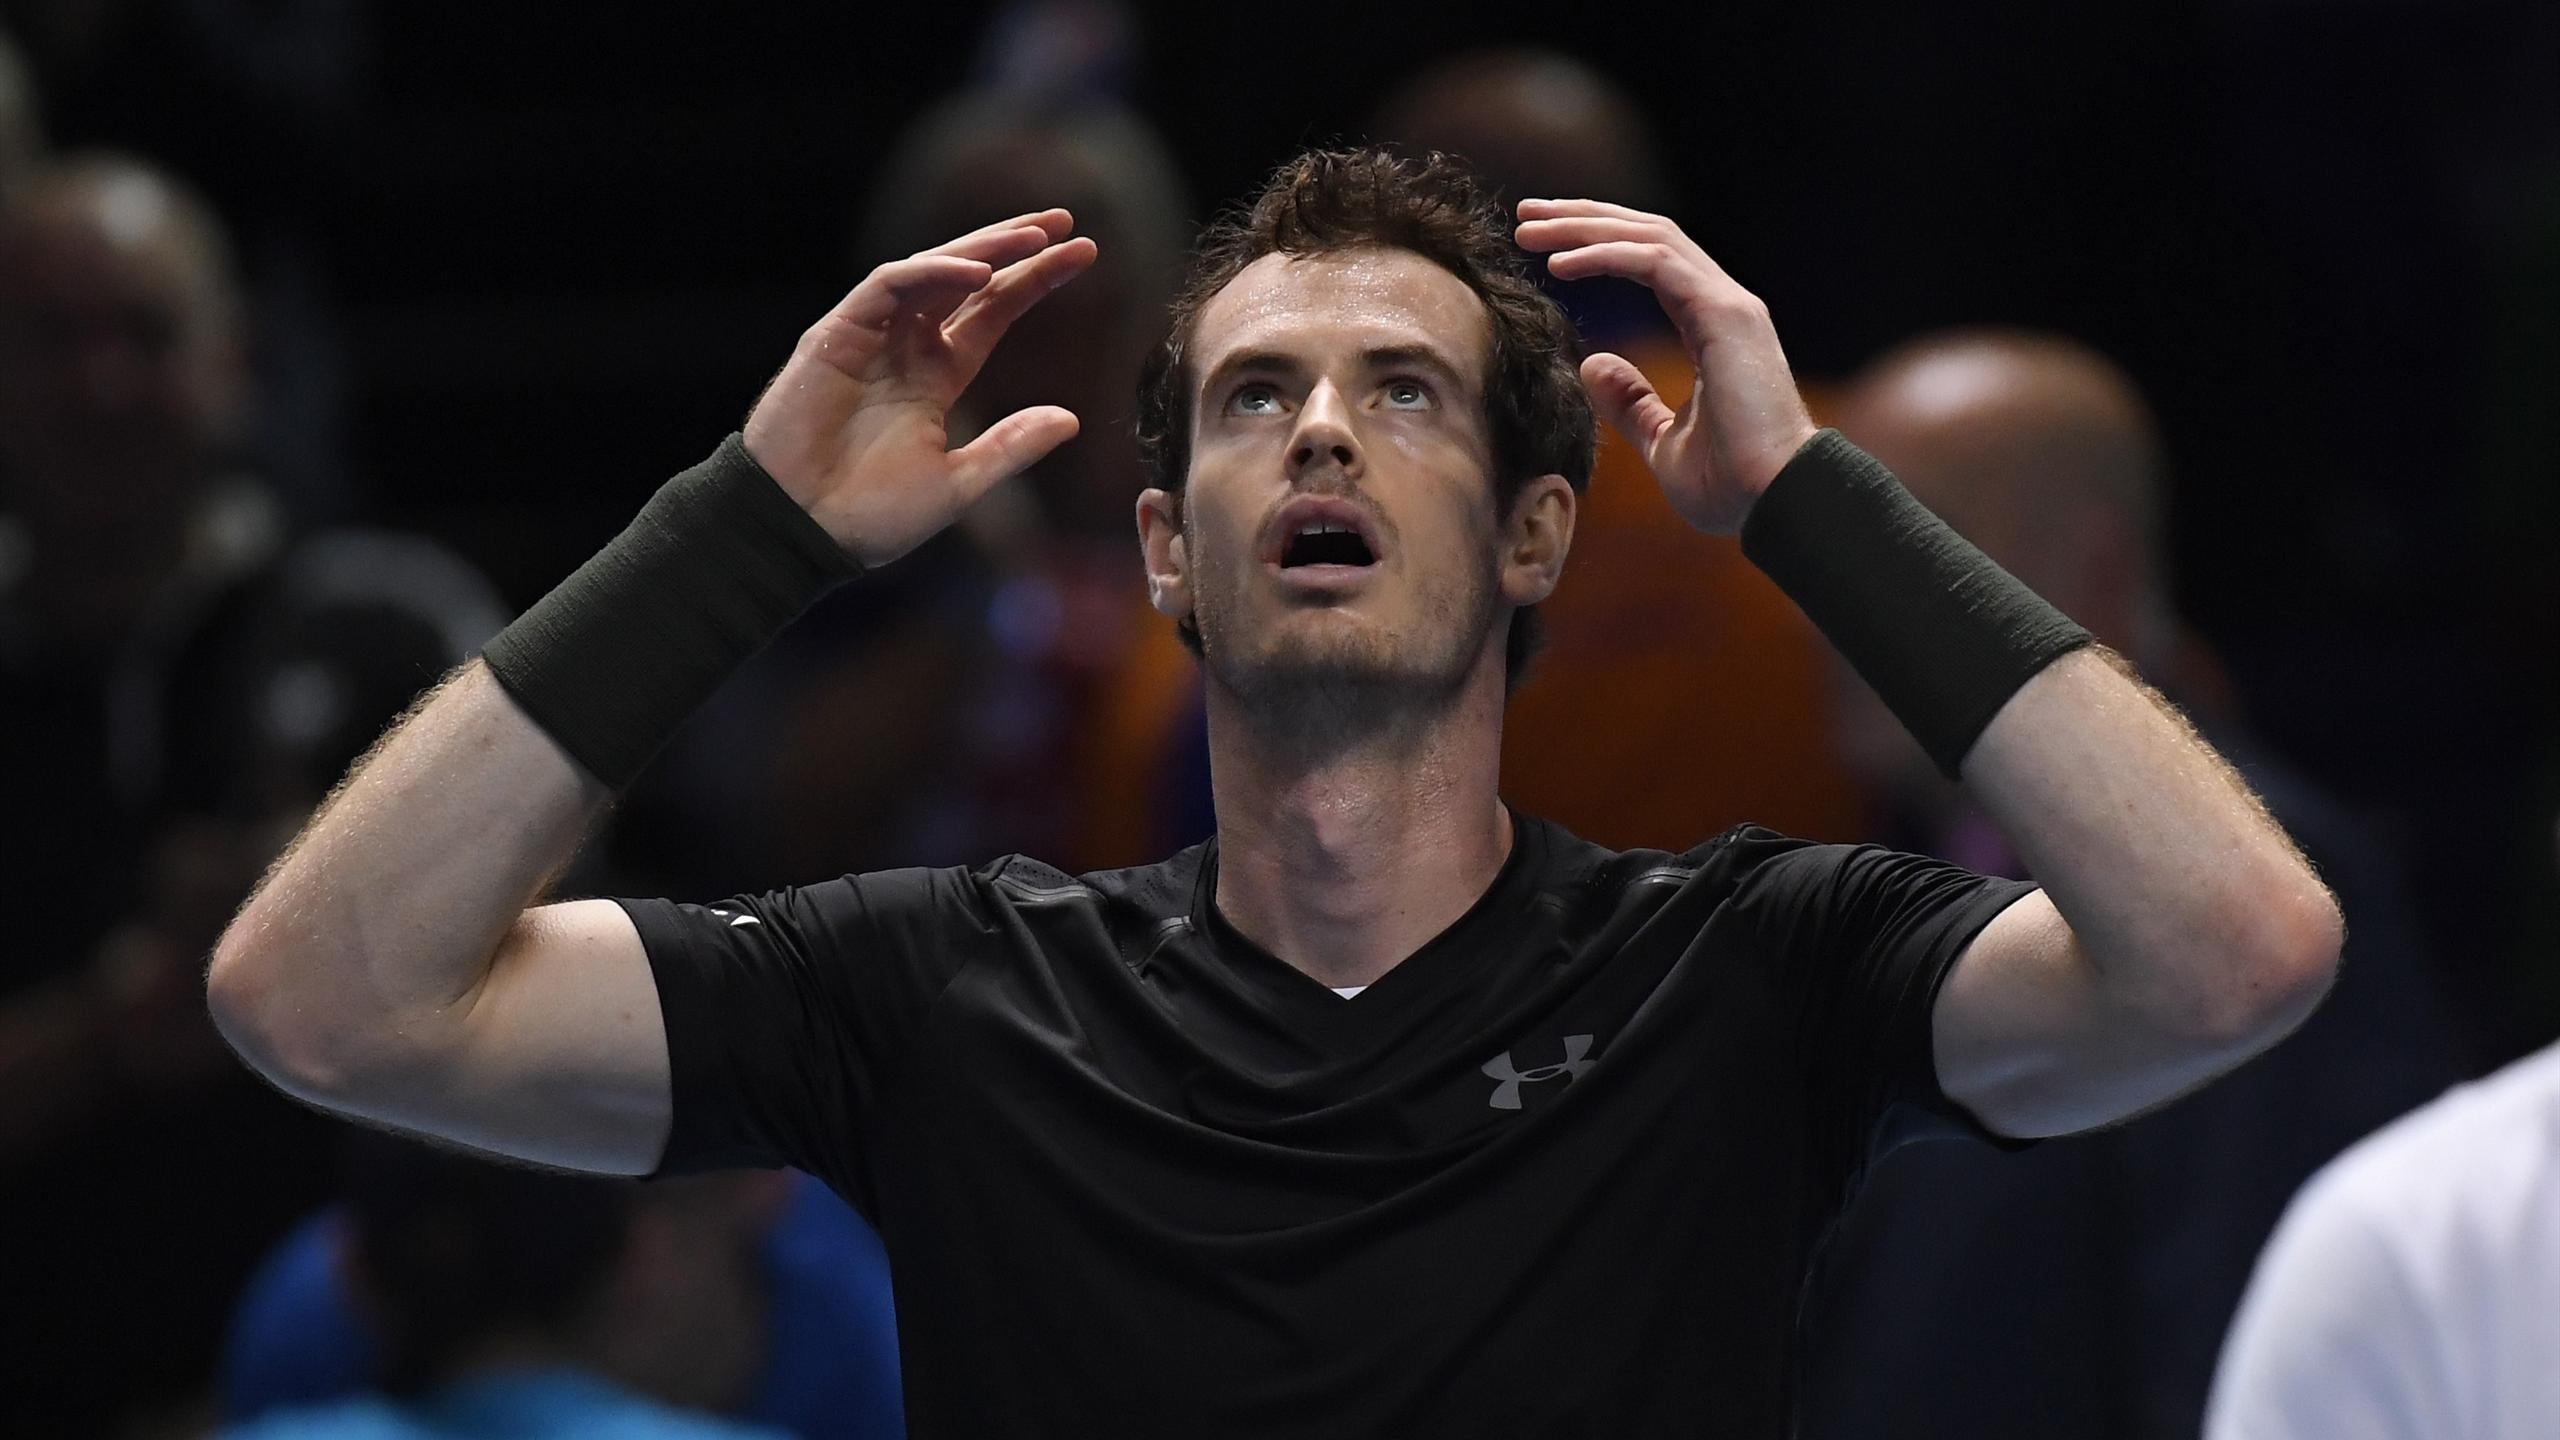 Great Britain's Andy Murray celebrates winning the final against Serbia's Novak Djokovic